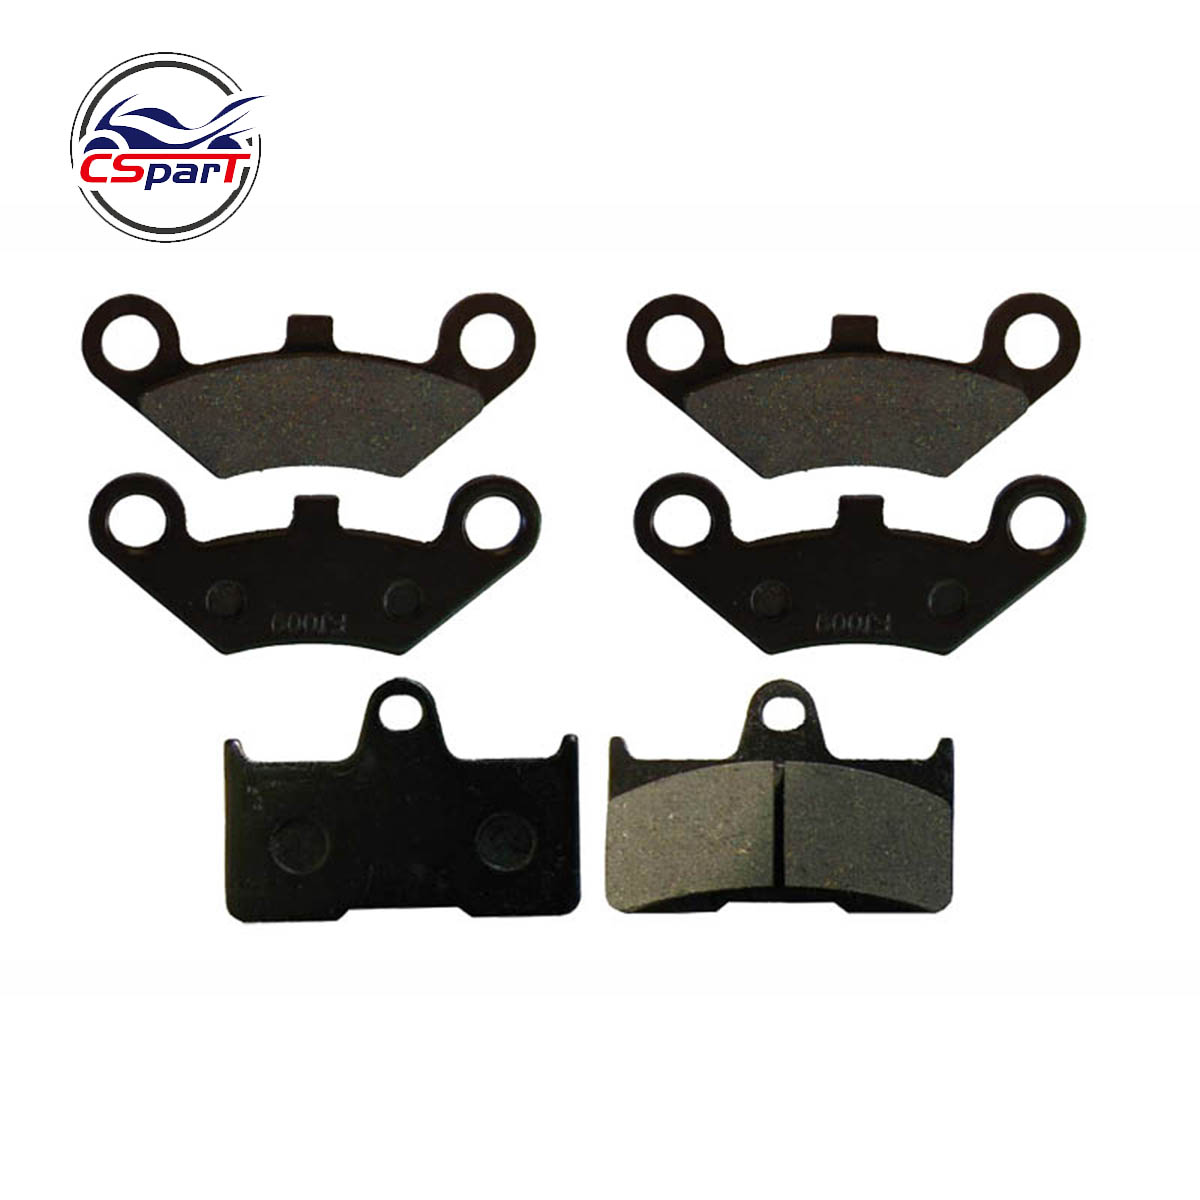 3 SET Front Rear Brake Pad For CFmoto CF500 CFORCE 450 550 600 800 X5 X6 X8 400CC 500CC 600CC 800CC ATV 9010-080810 9010-080510